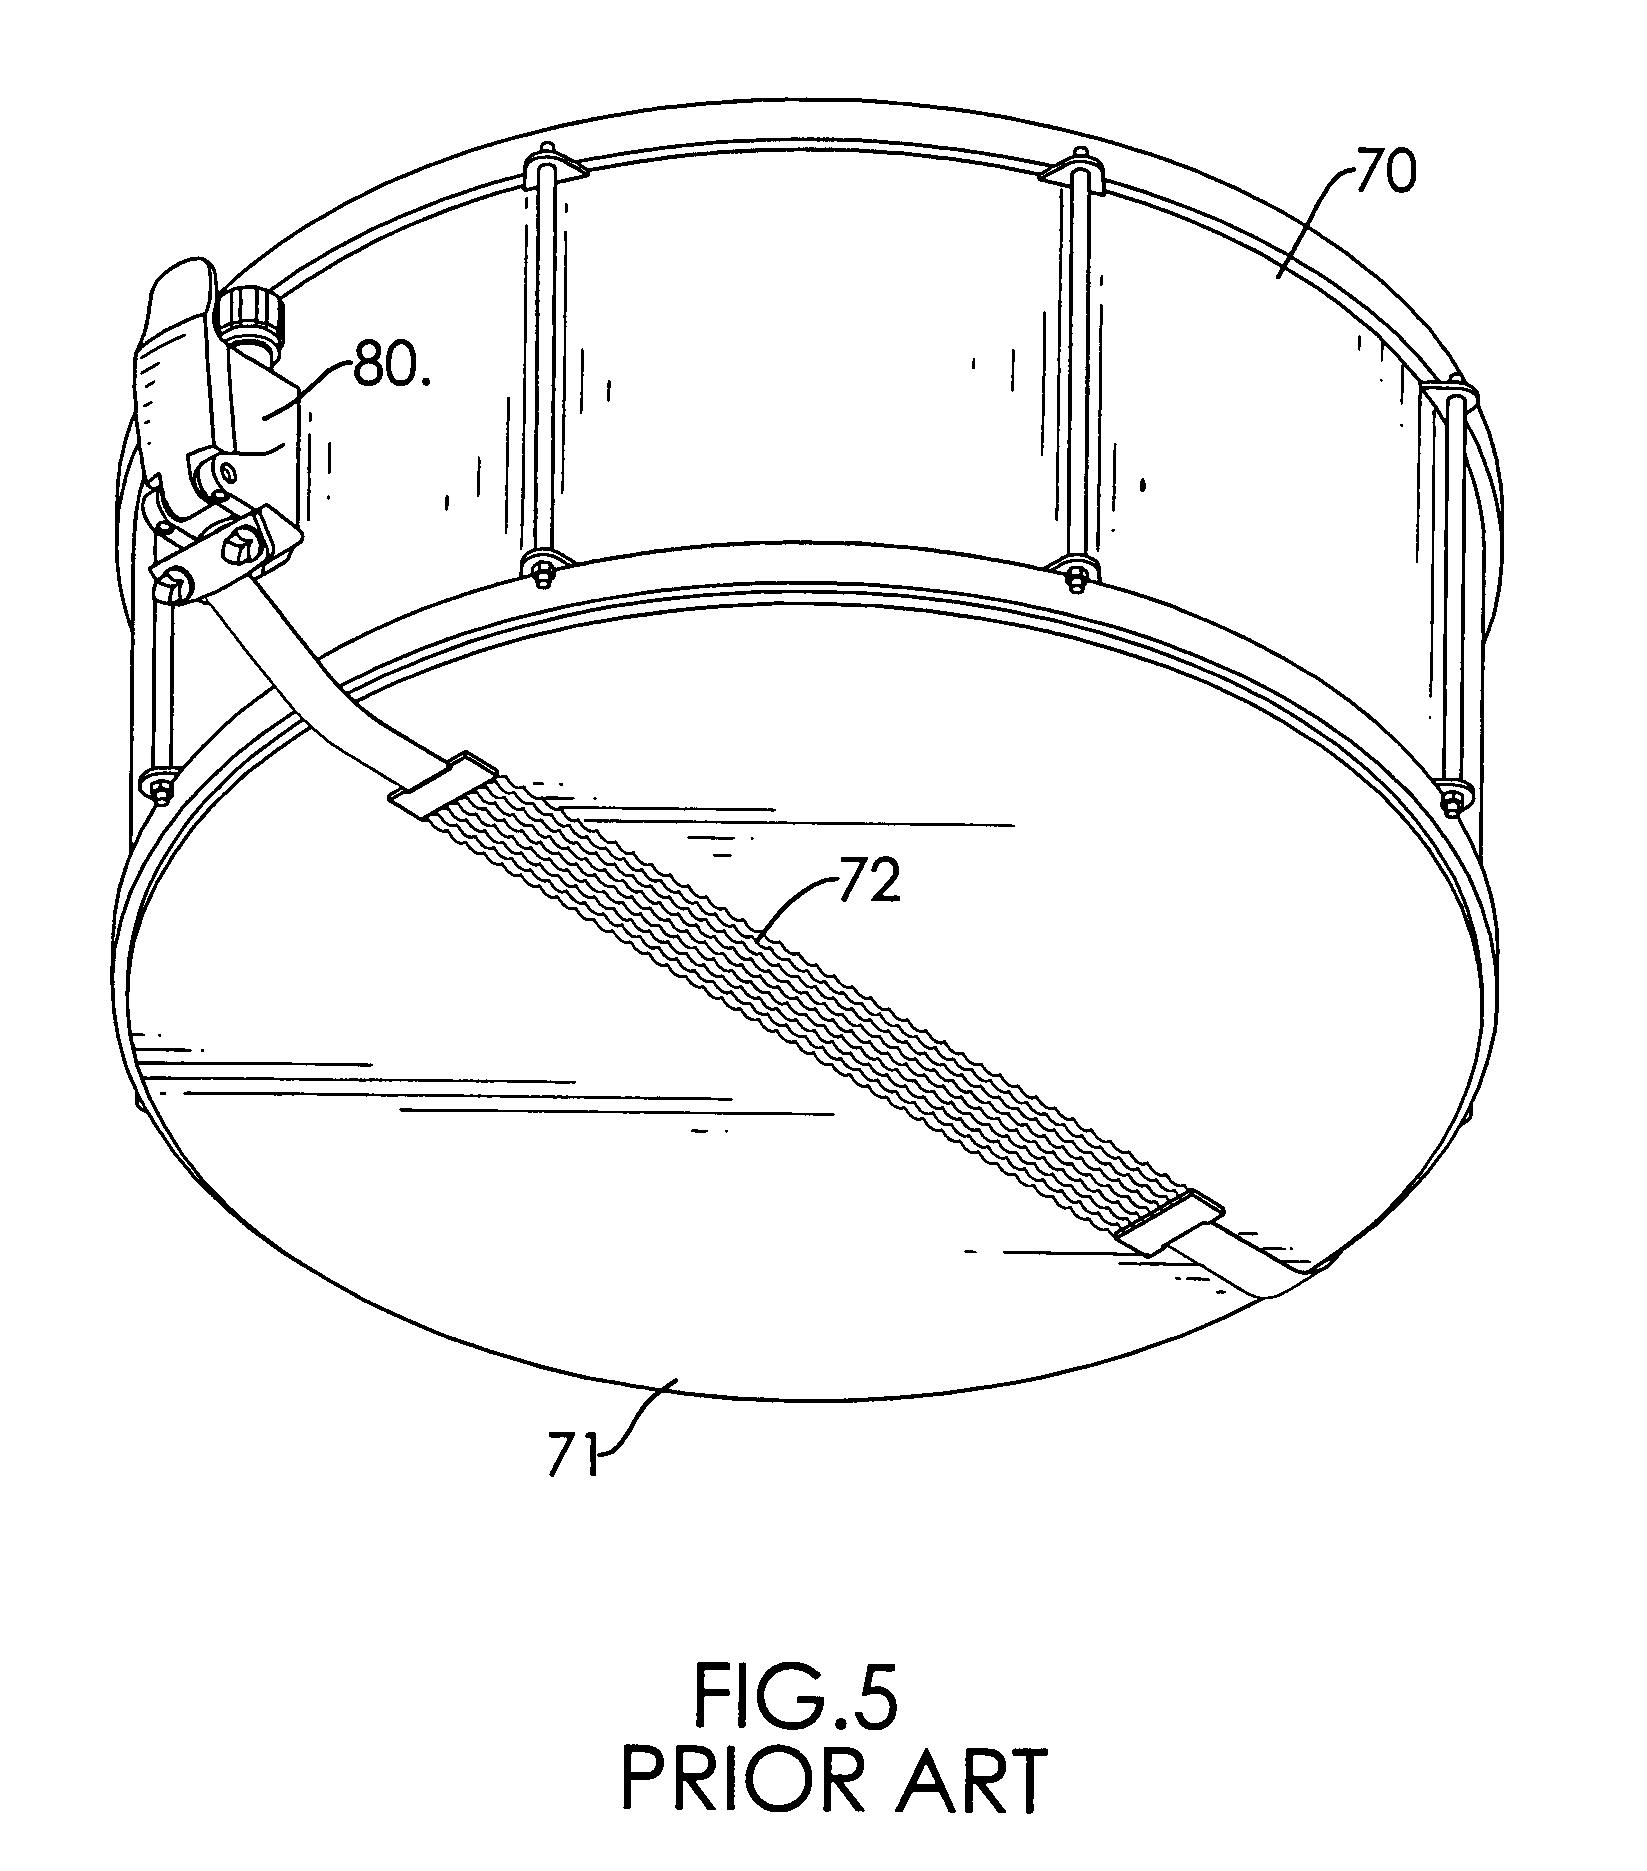 Kawasaki mule gas engine kz1000 wiring diagram at ww1 freeautoresponder co